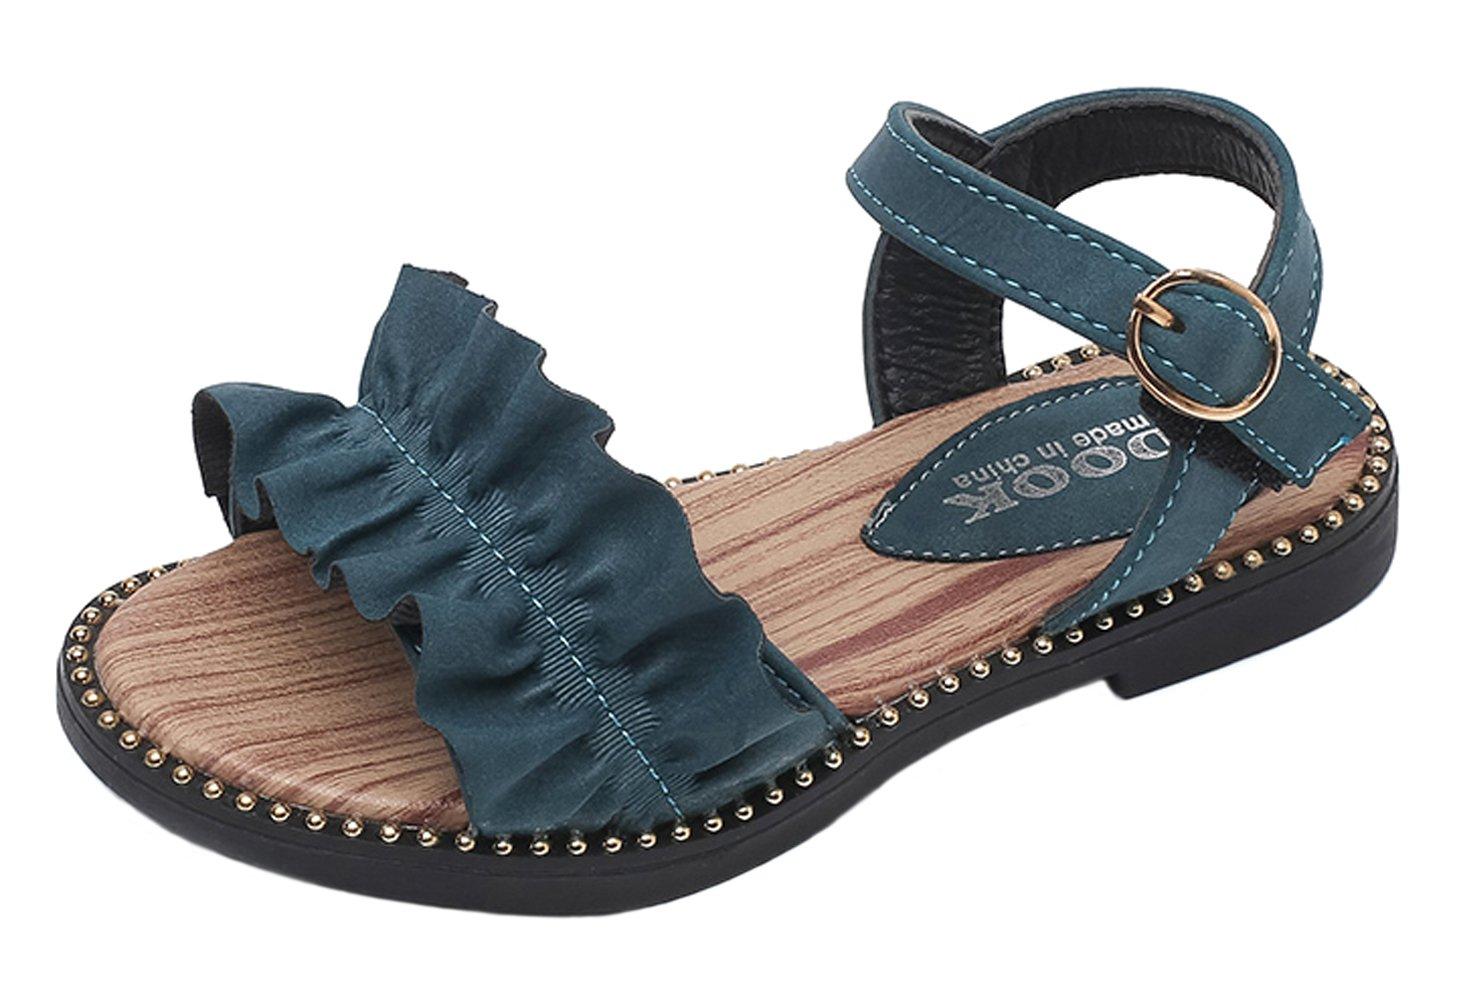 WUIWUIYU Girls Ankle Strap Buckle Flower Leather Walking Flat Sandals Open Toe Summer Princess Shoes by WUIWUIYU